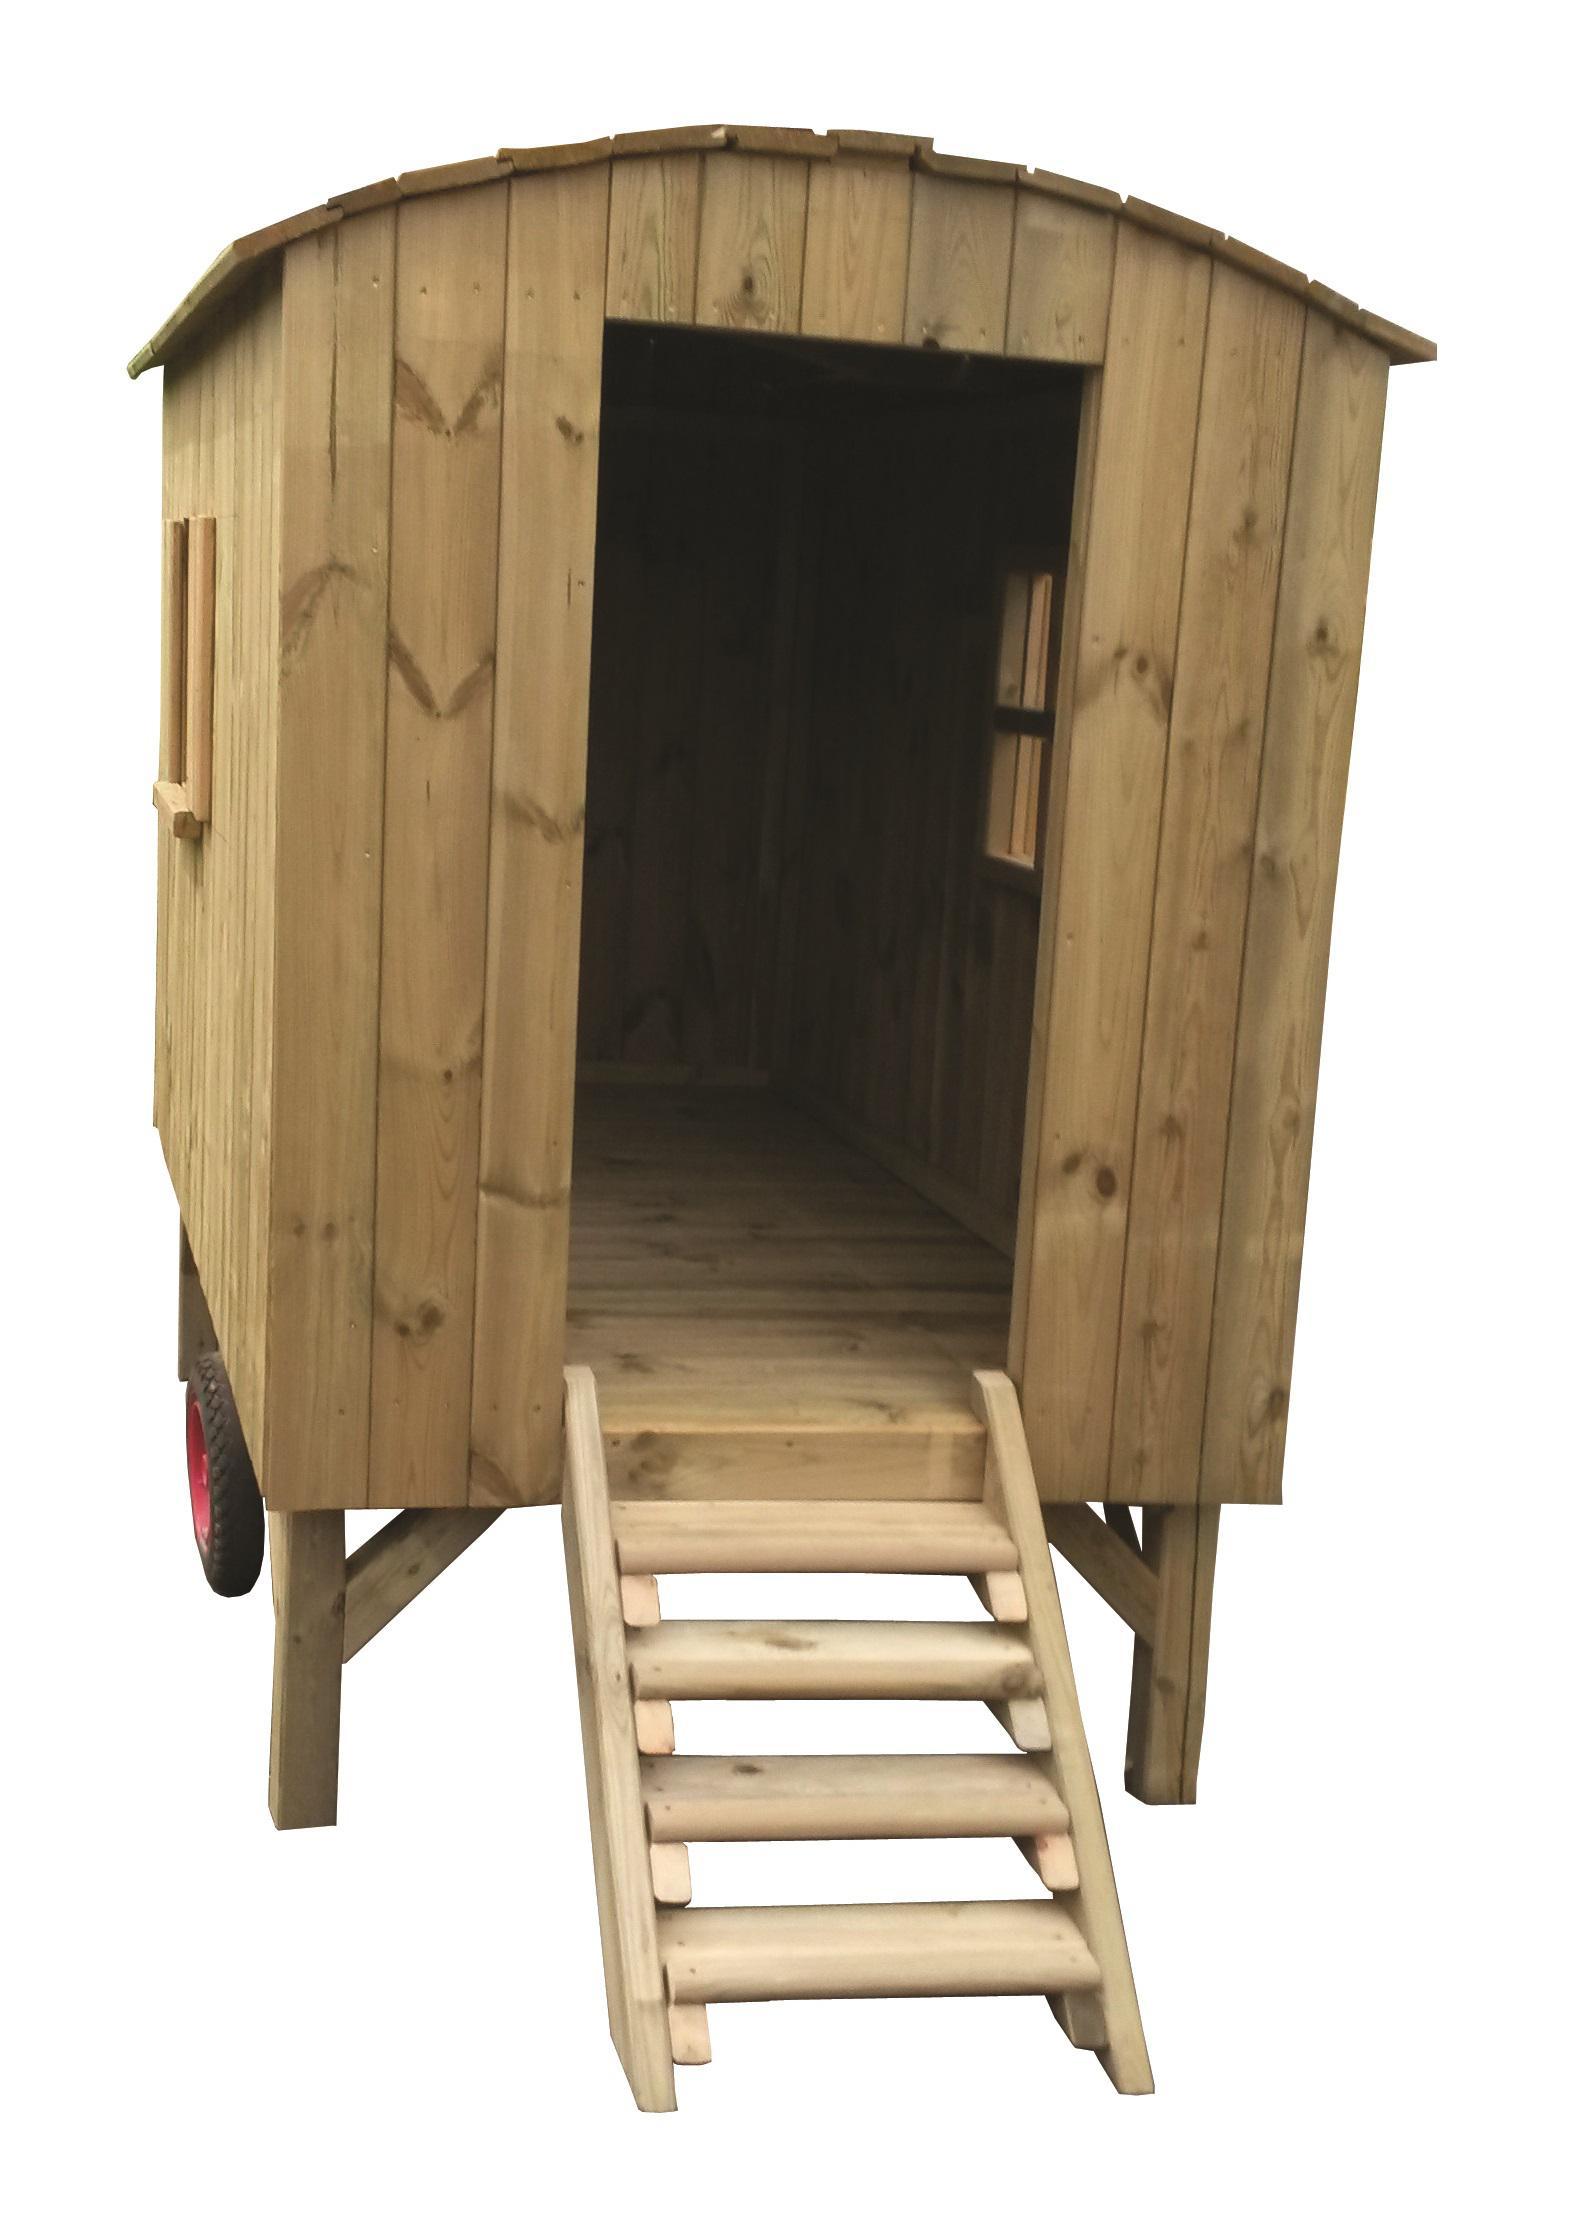 allstars bauwagen baustellenwagen spielhaus kinderspielhaus holz kaufen bei euro direkt. Black Bedroom Furniture Sets. Home Design Ideas